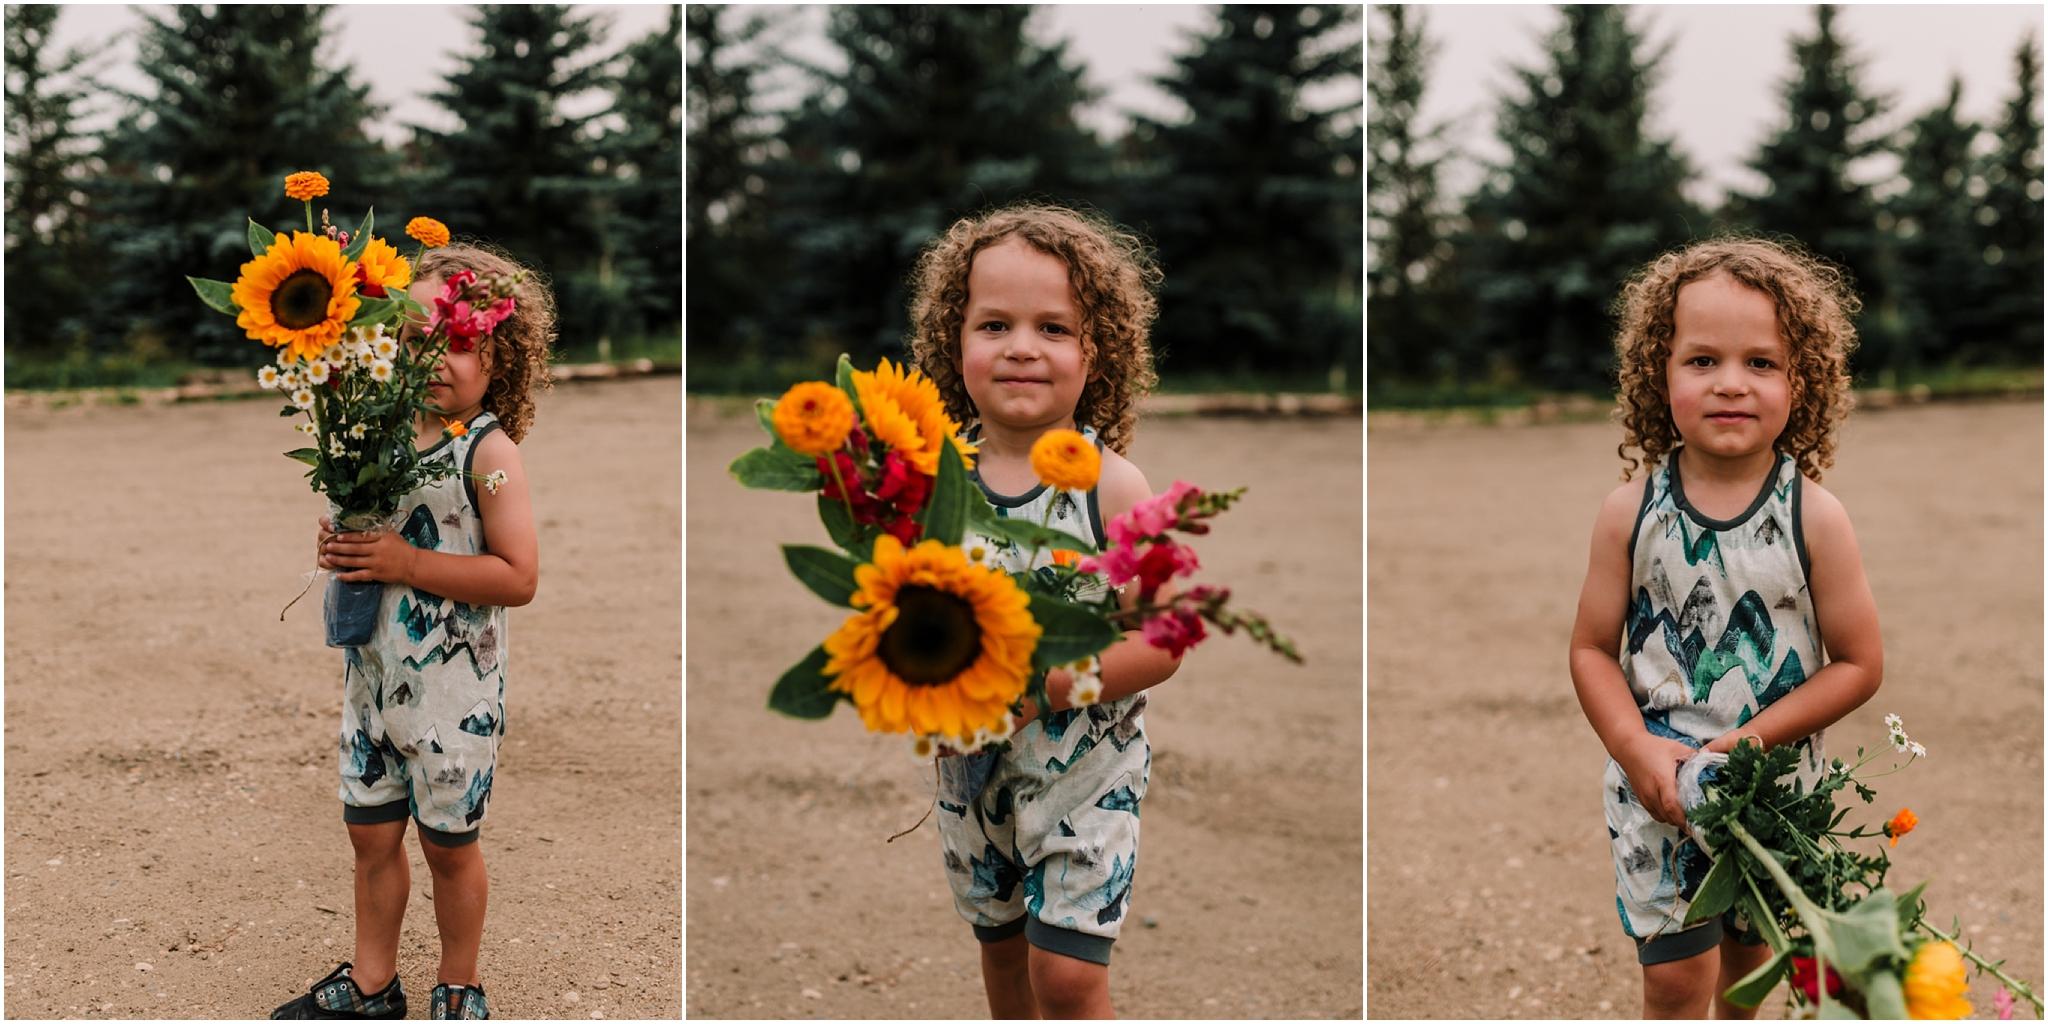 Treelines Photography - Edmonton Family Photographer - Flower Picking - Bouquet - Sunflowers - Edmonton